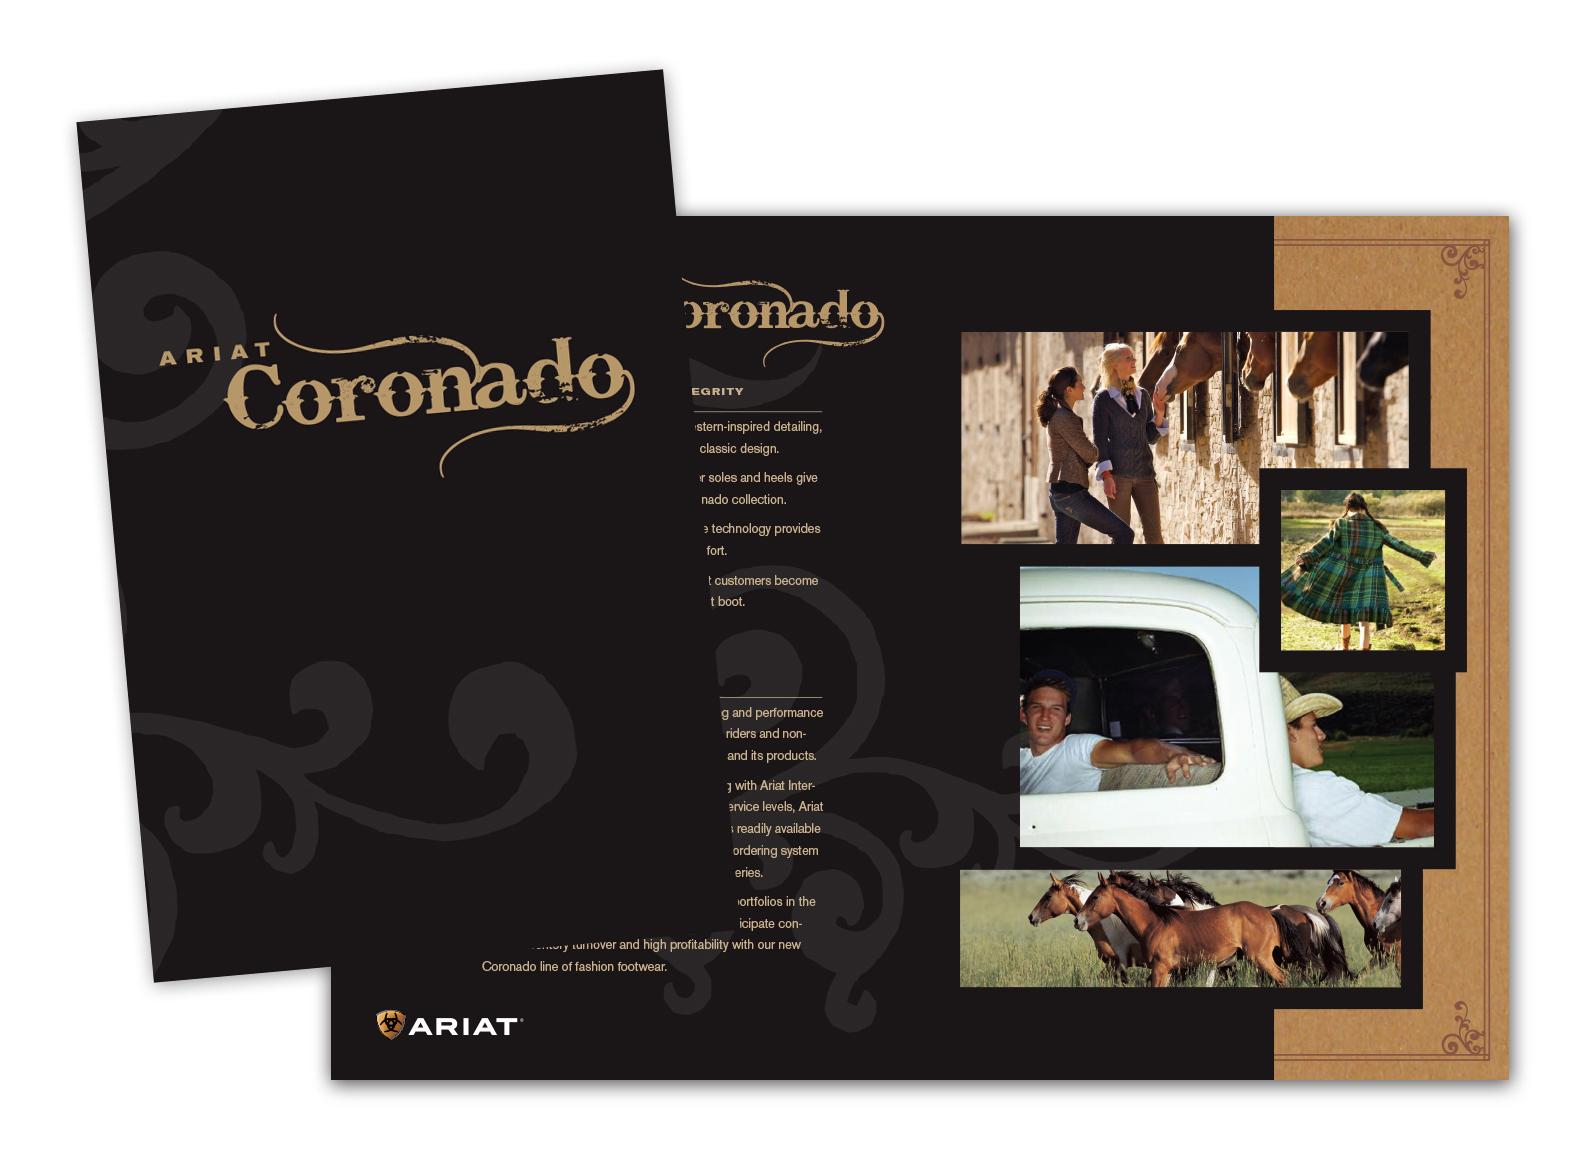 AR_Coronado_brochure2_F.jpg